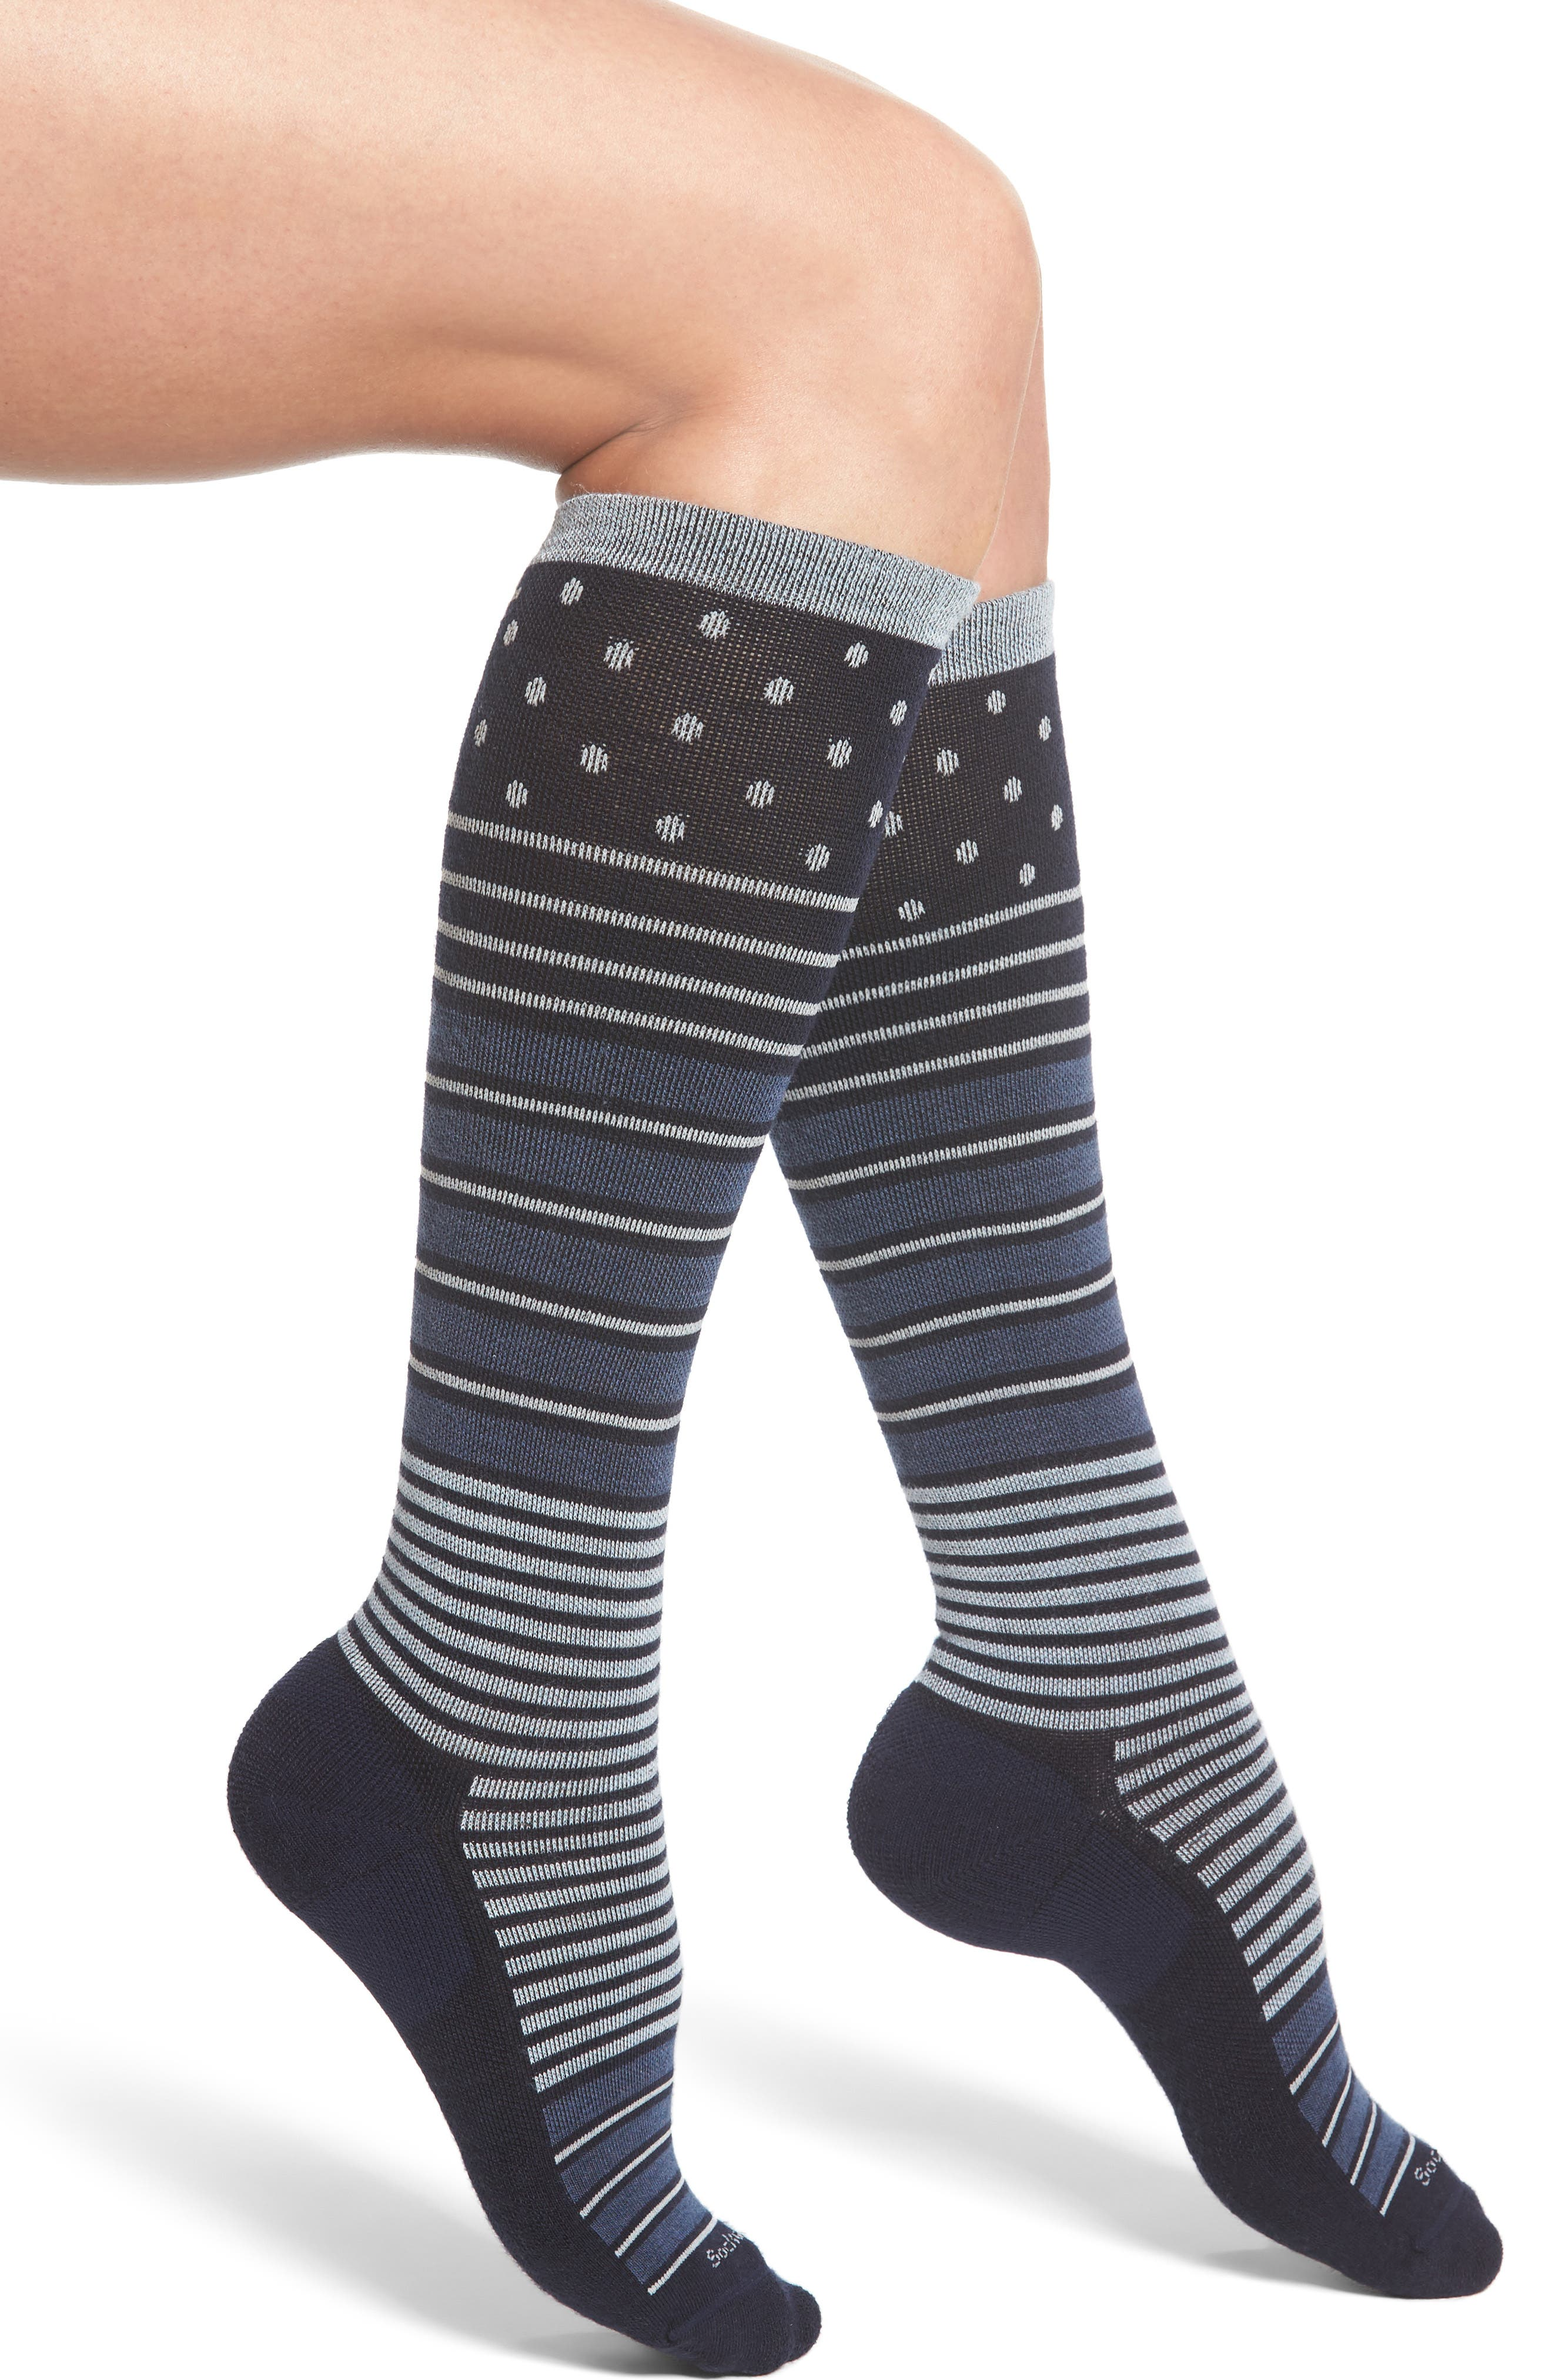 Alternate Image 1 Selected - Sockwell 'Twister' Merino Wool Blend Compression Socks